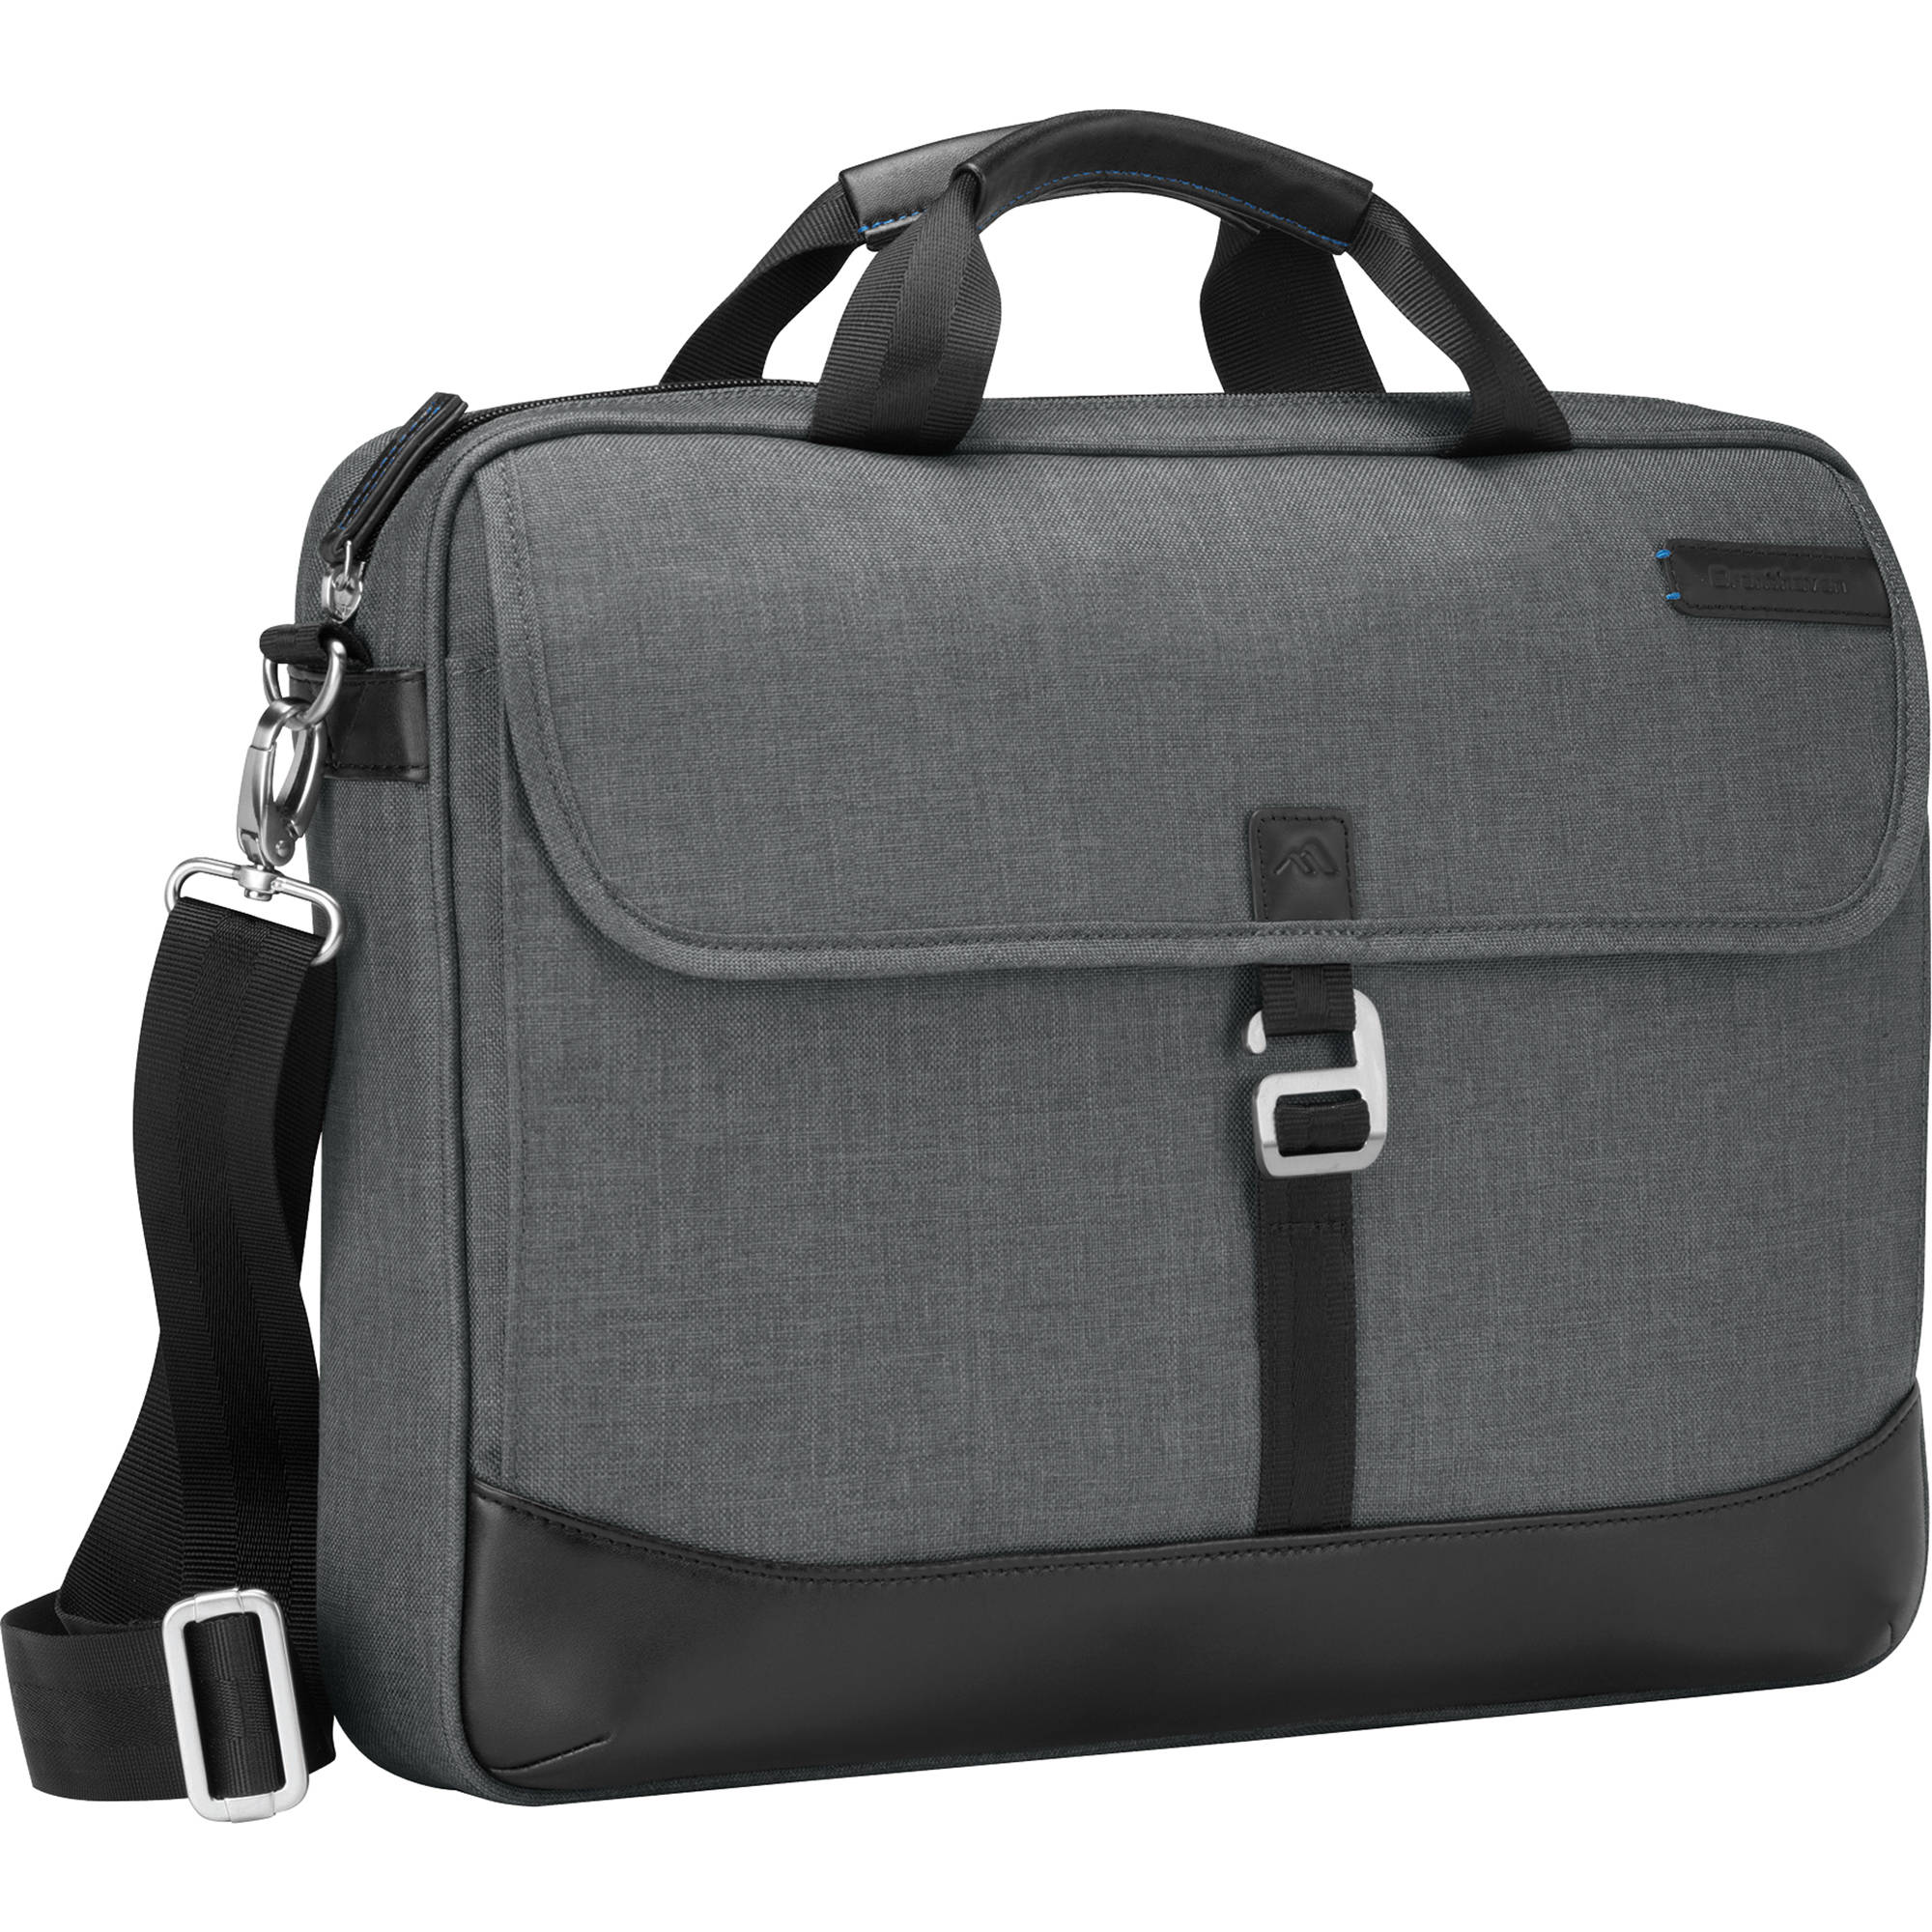 brenthaven collins slim briefcase photo - 1